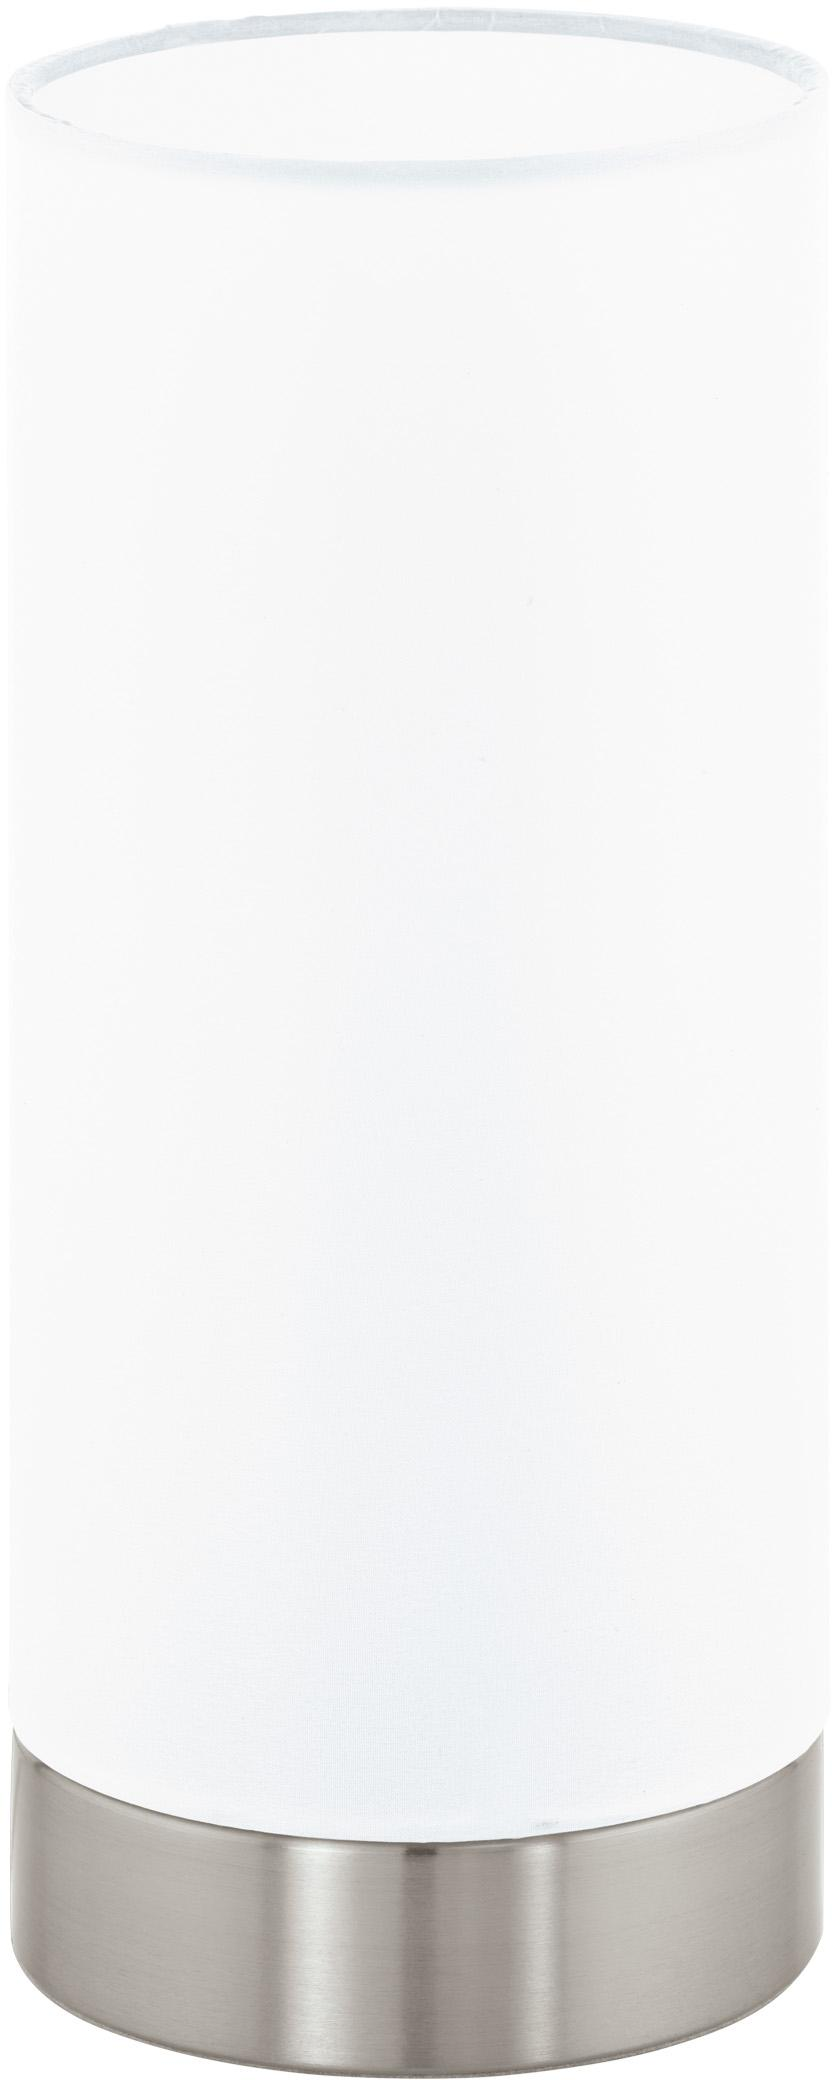 Lámpara de mesa regulable Pasteri, Pantalla: poliéster, Cable: plástico, Blanco, níquel, Ø 12 x Al 26 cm